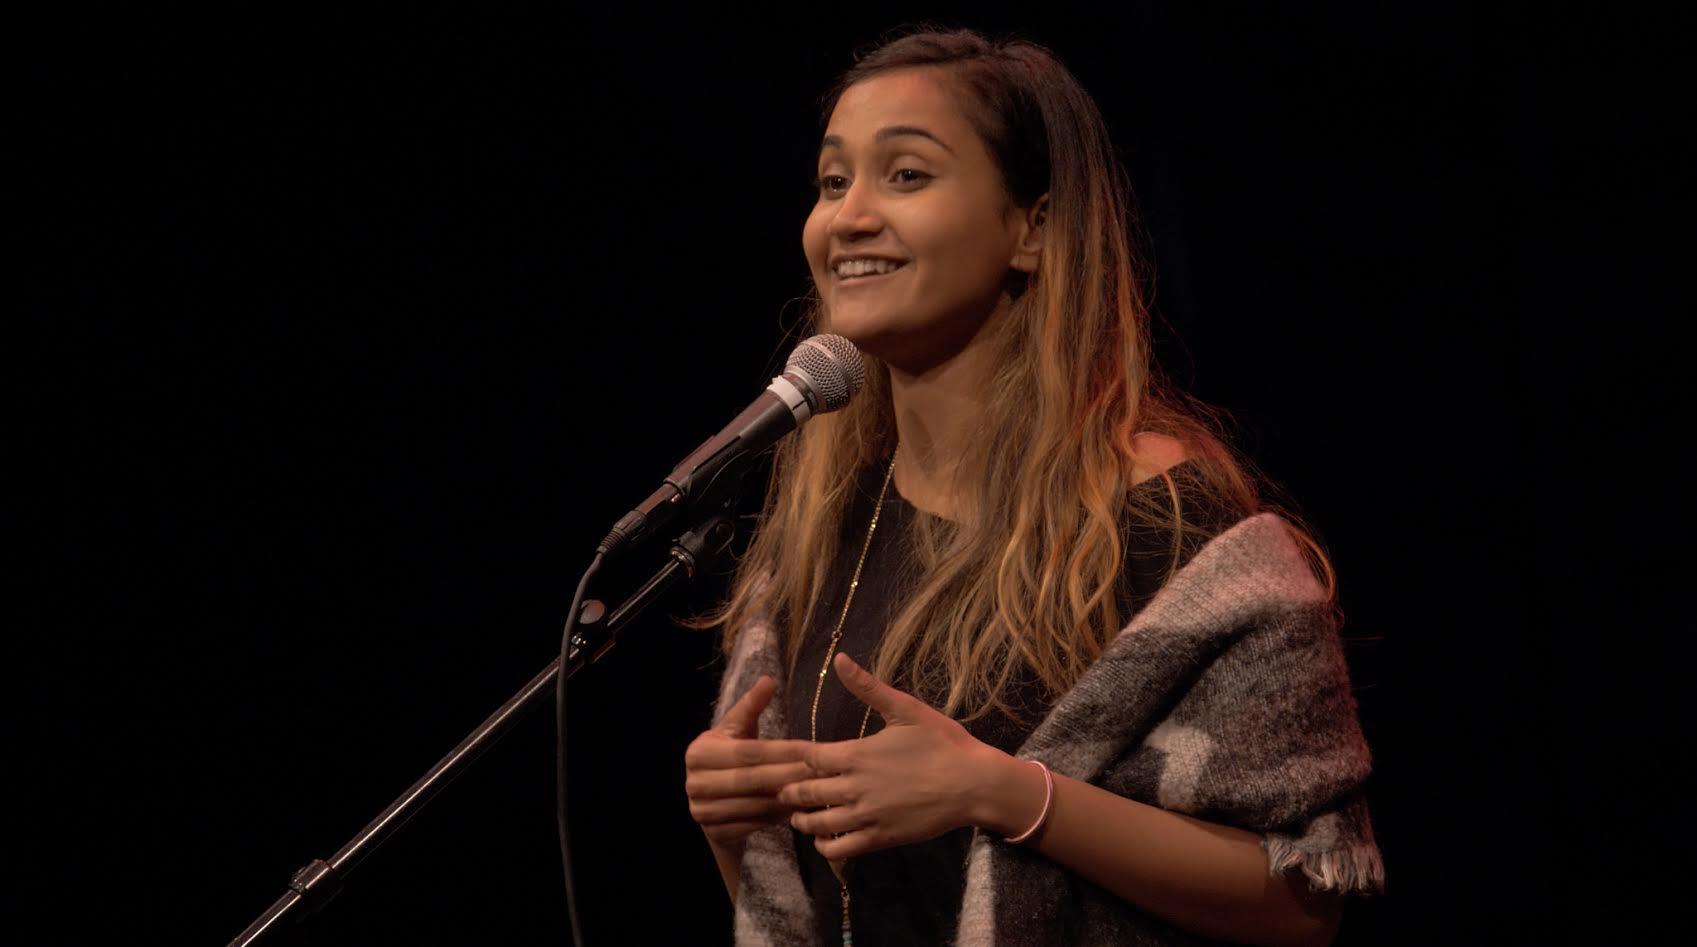 Anjalica Soloman, slam poet